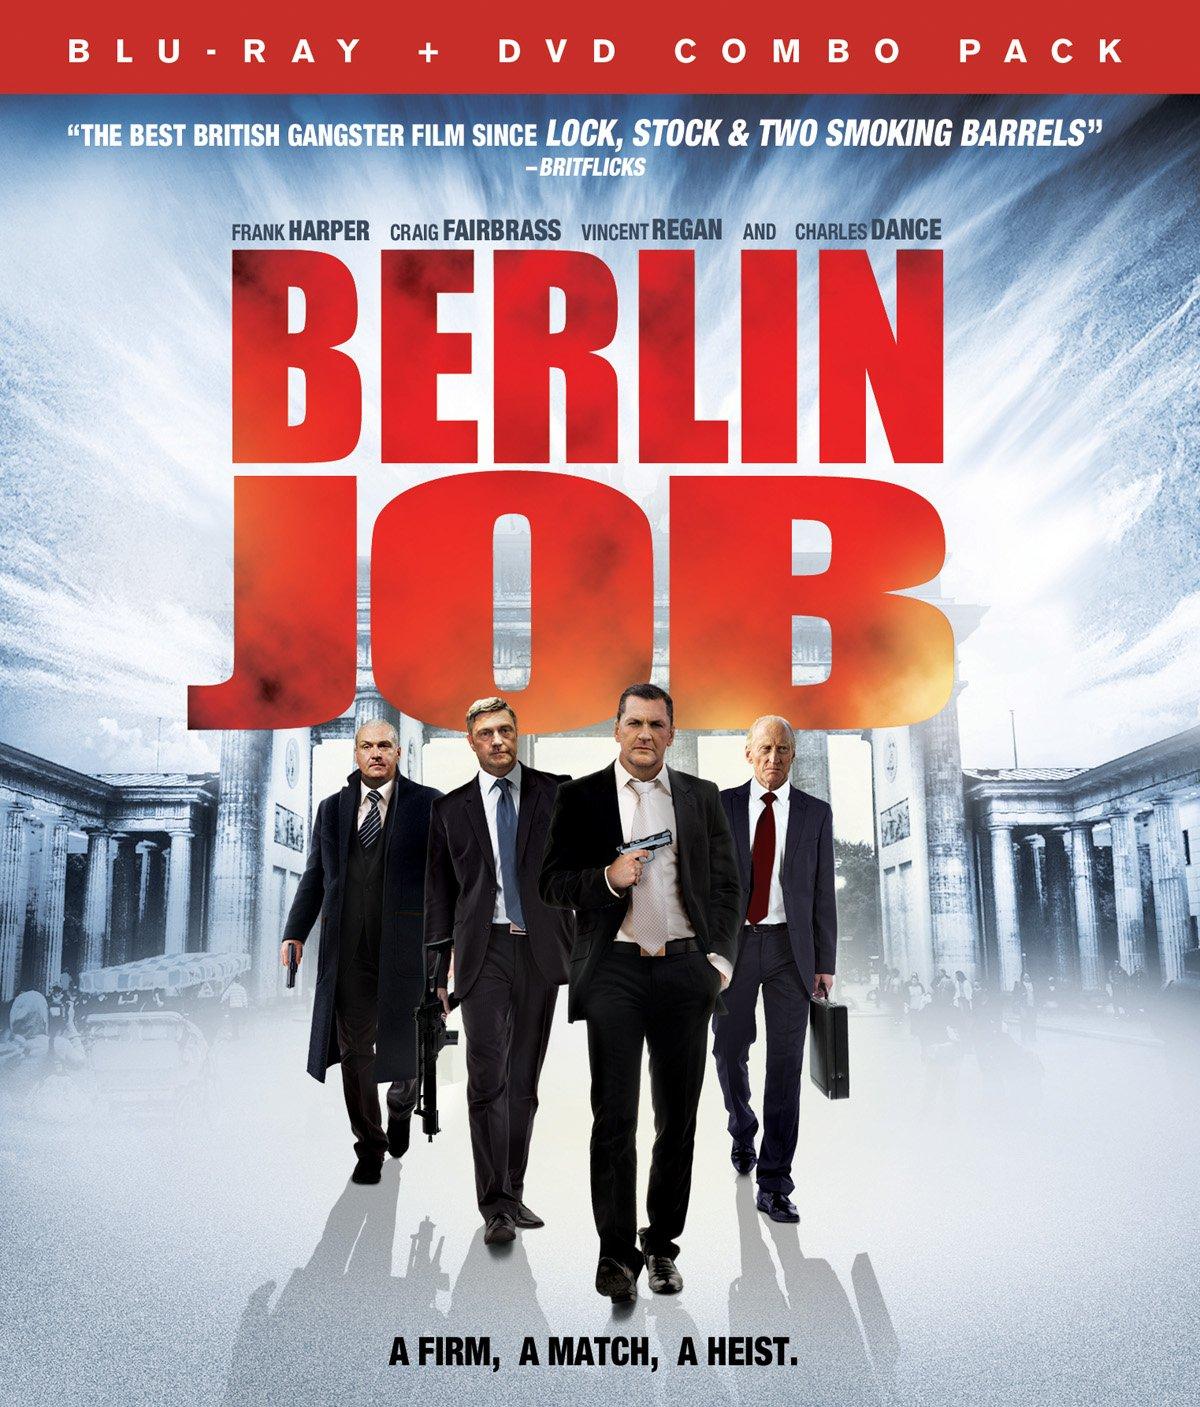 Blu-ray : Berlin Job (With DVD, 2 Pack, 2PC)